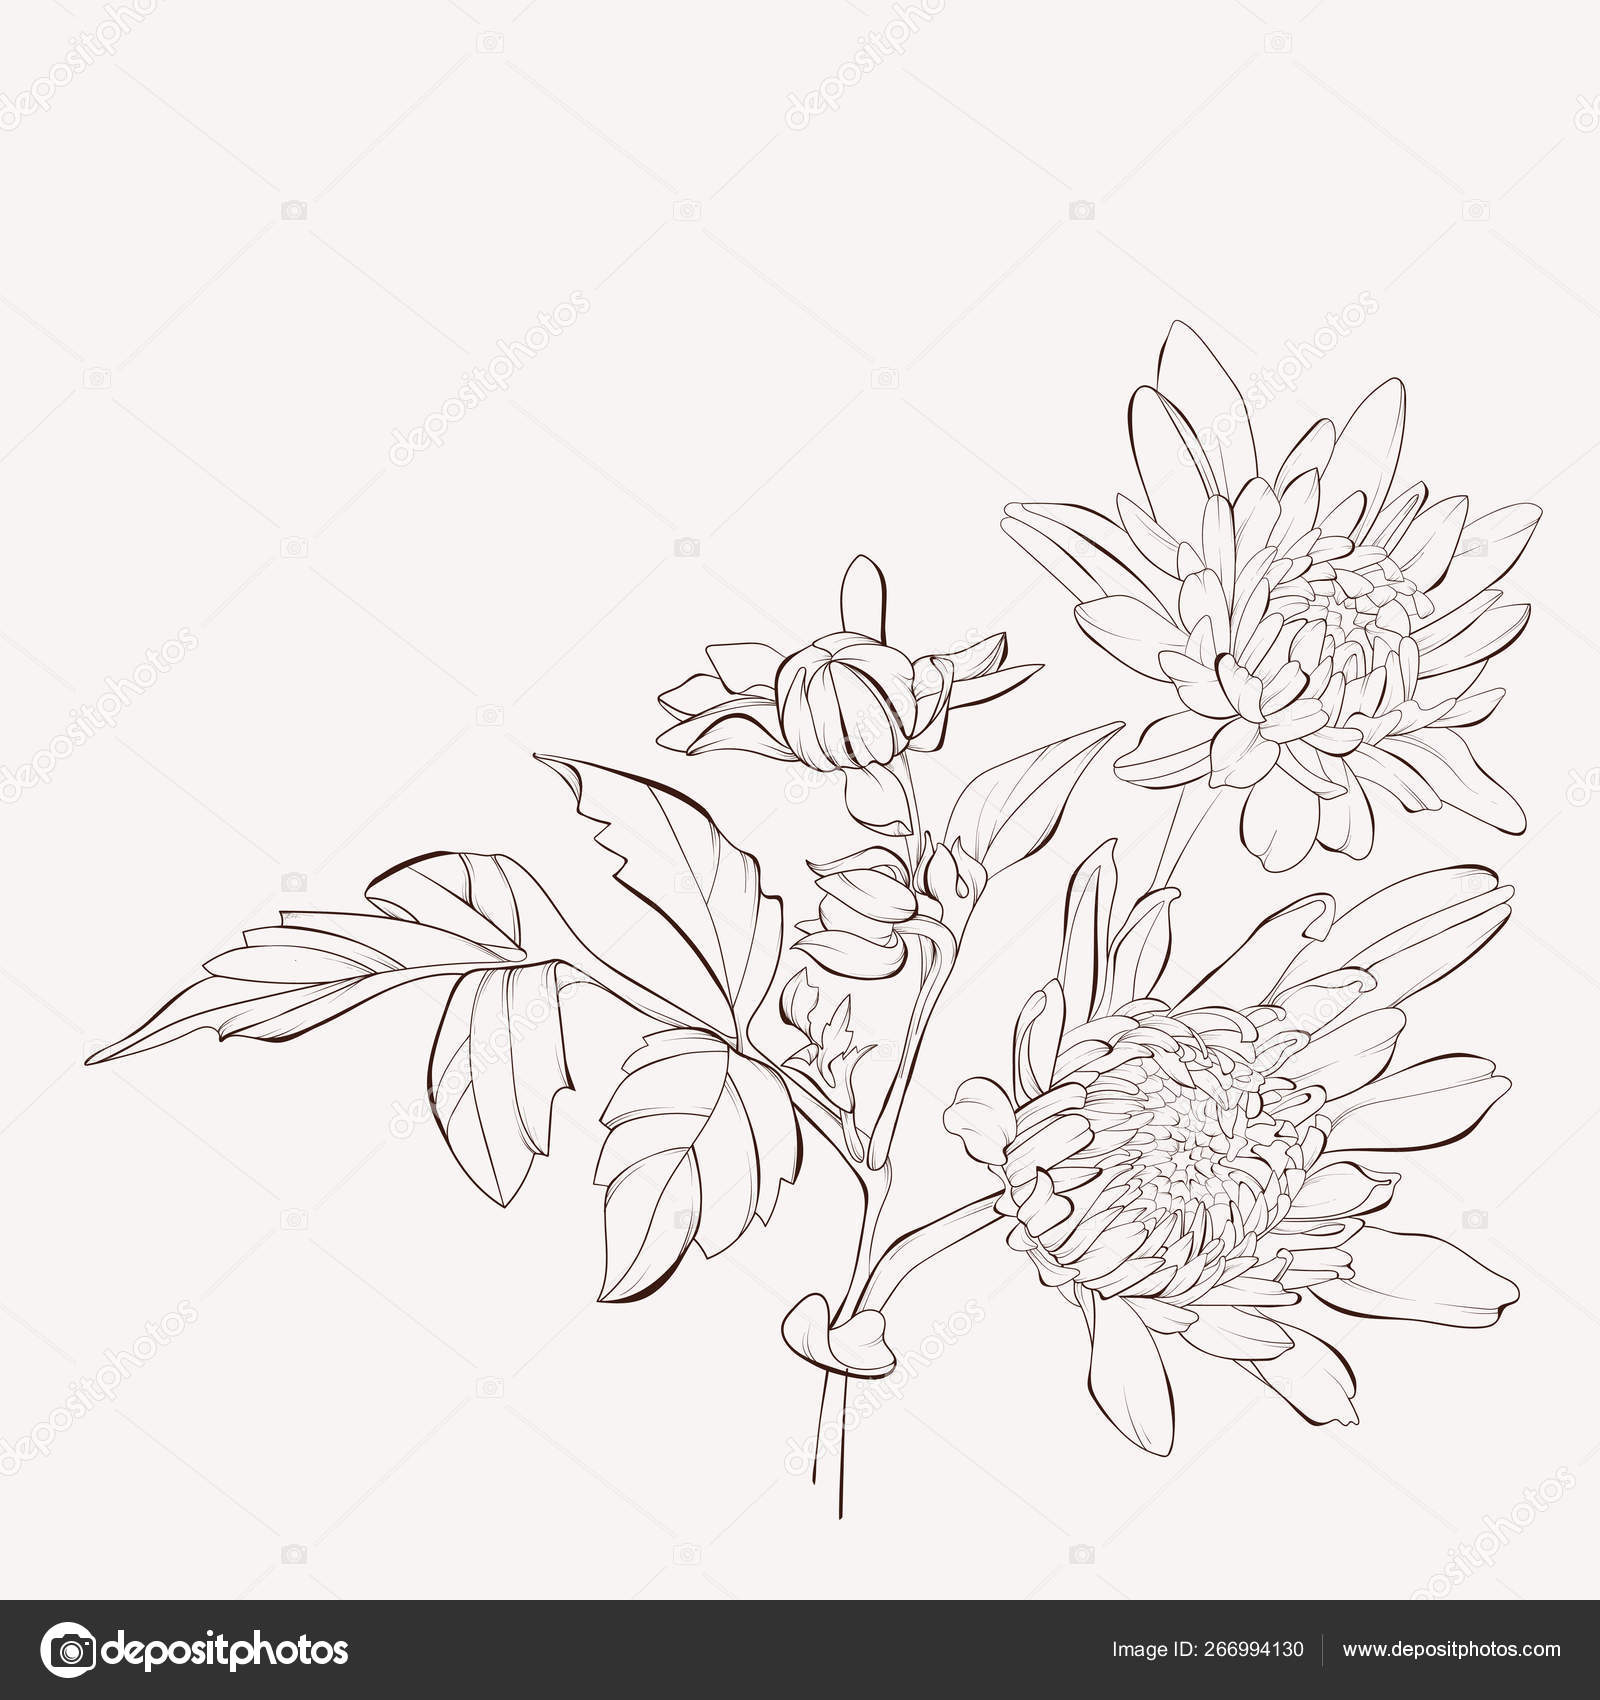 Vector Dahlia Flower Autumn Flowers Bouquet Element Design Hand Drawn Stock Vector C Jbunina 266994130